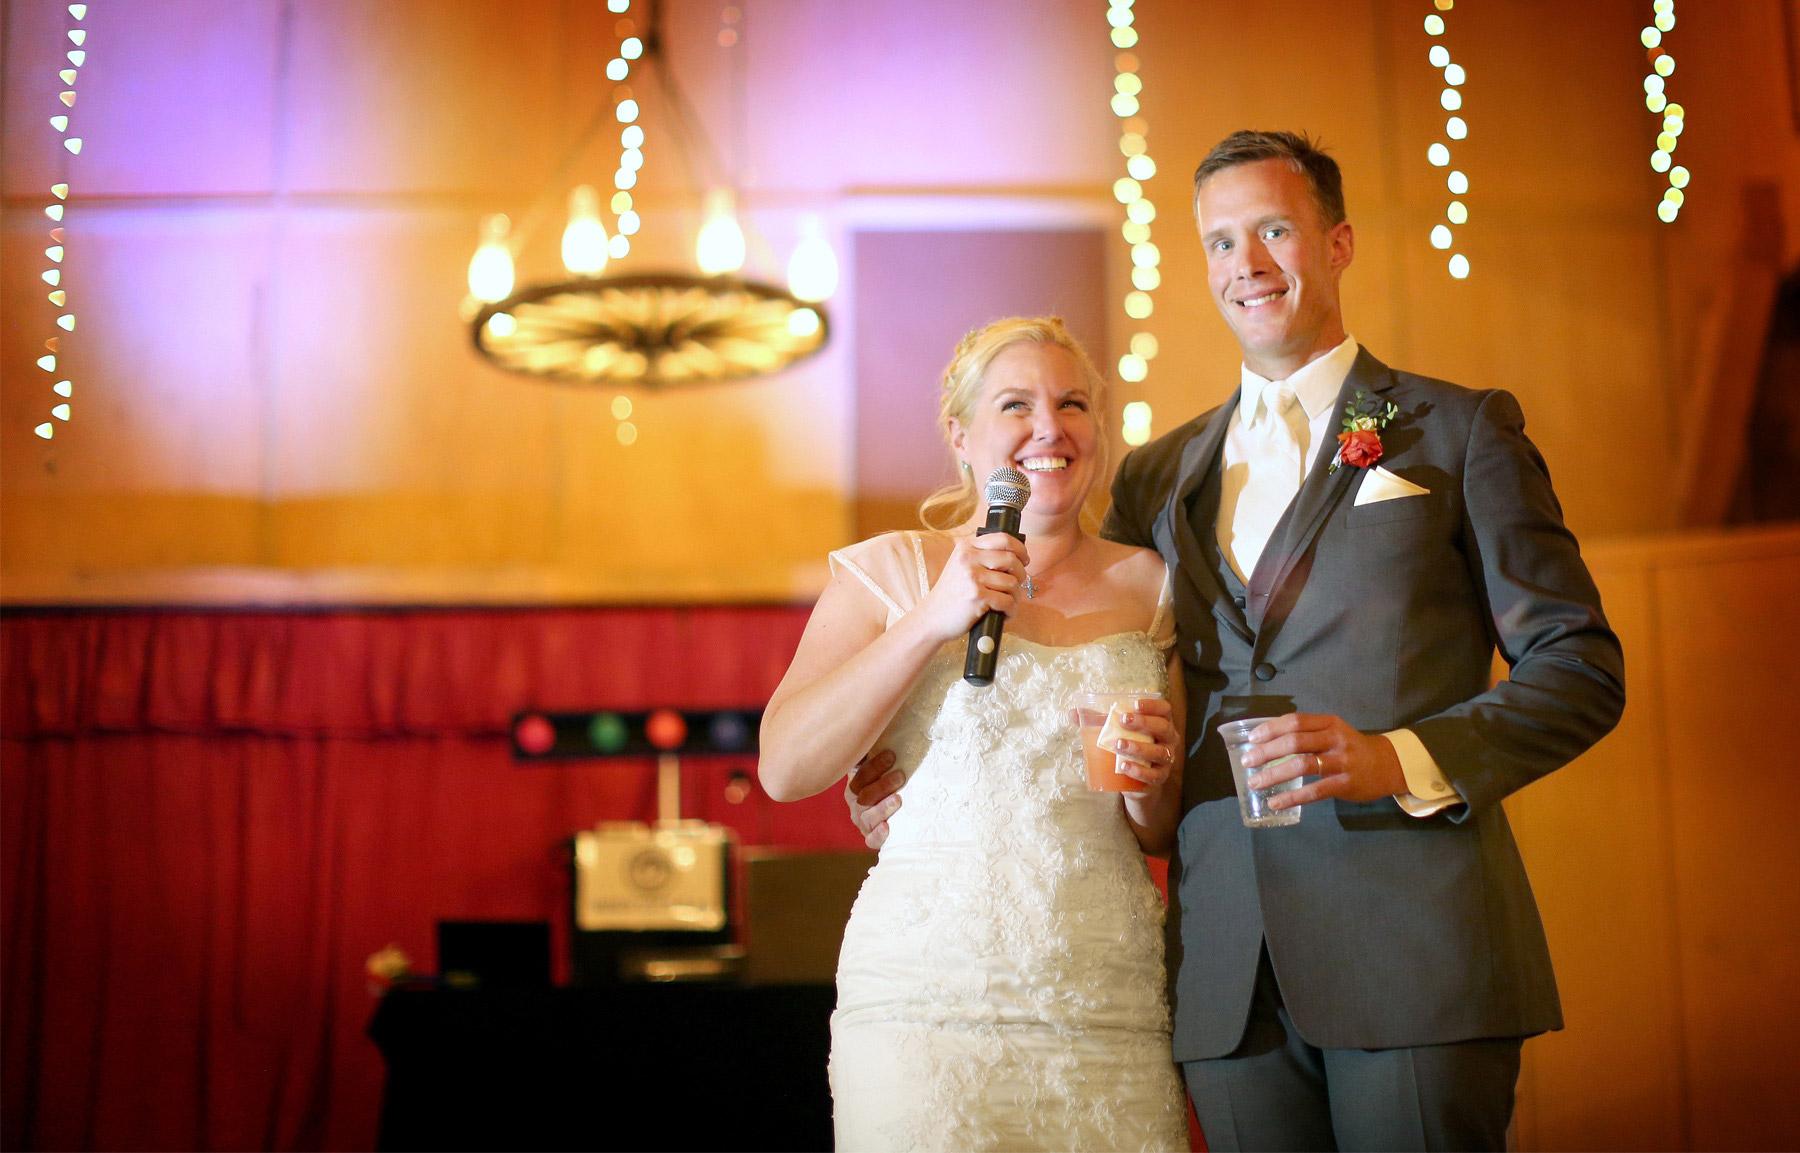 17-Tuscan-Arizona-Wedding-Photography-by-Vick-Photography-Destination-Wedding-Desert-Old-Tucson-Studios-Reception-Speech-Elsa-and-Arthur.jpg